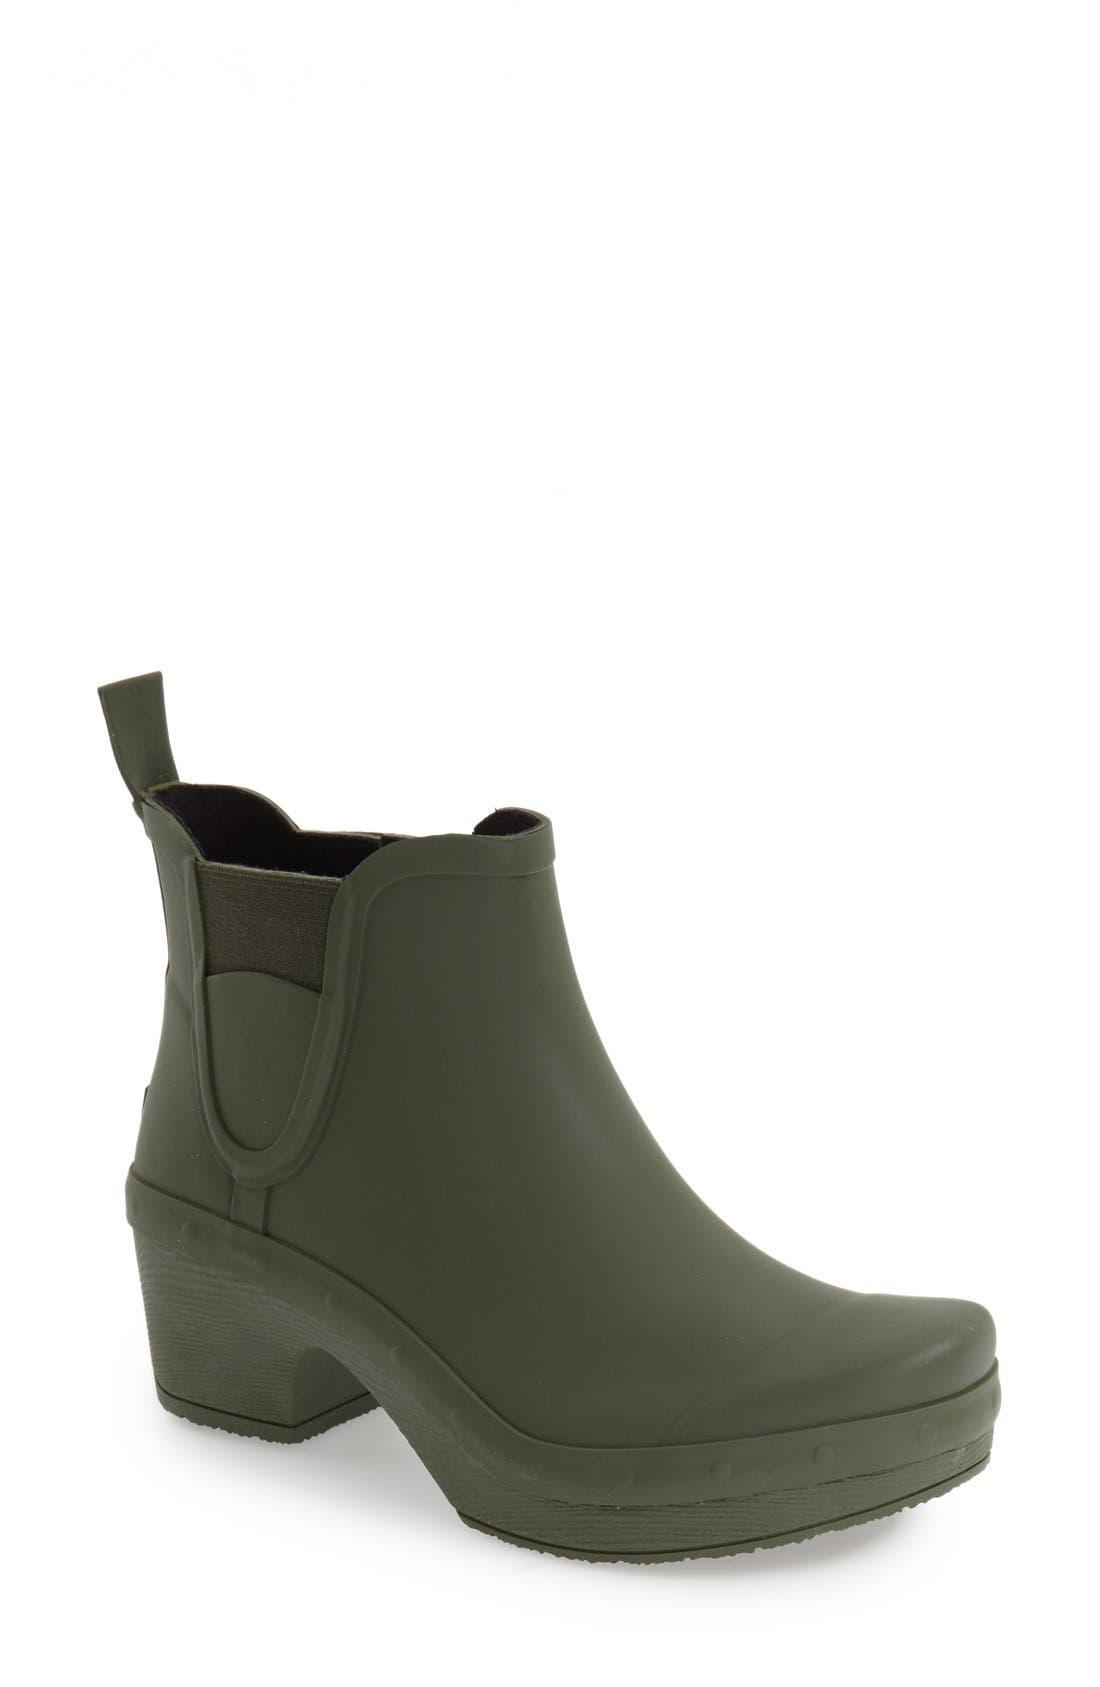 Main Image - Dansko 'Rosa' Chelsea Rain Boot (Women)